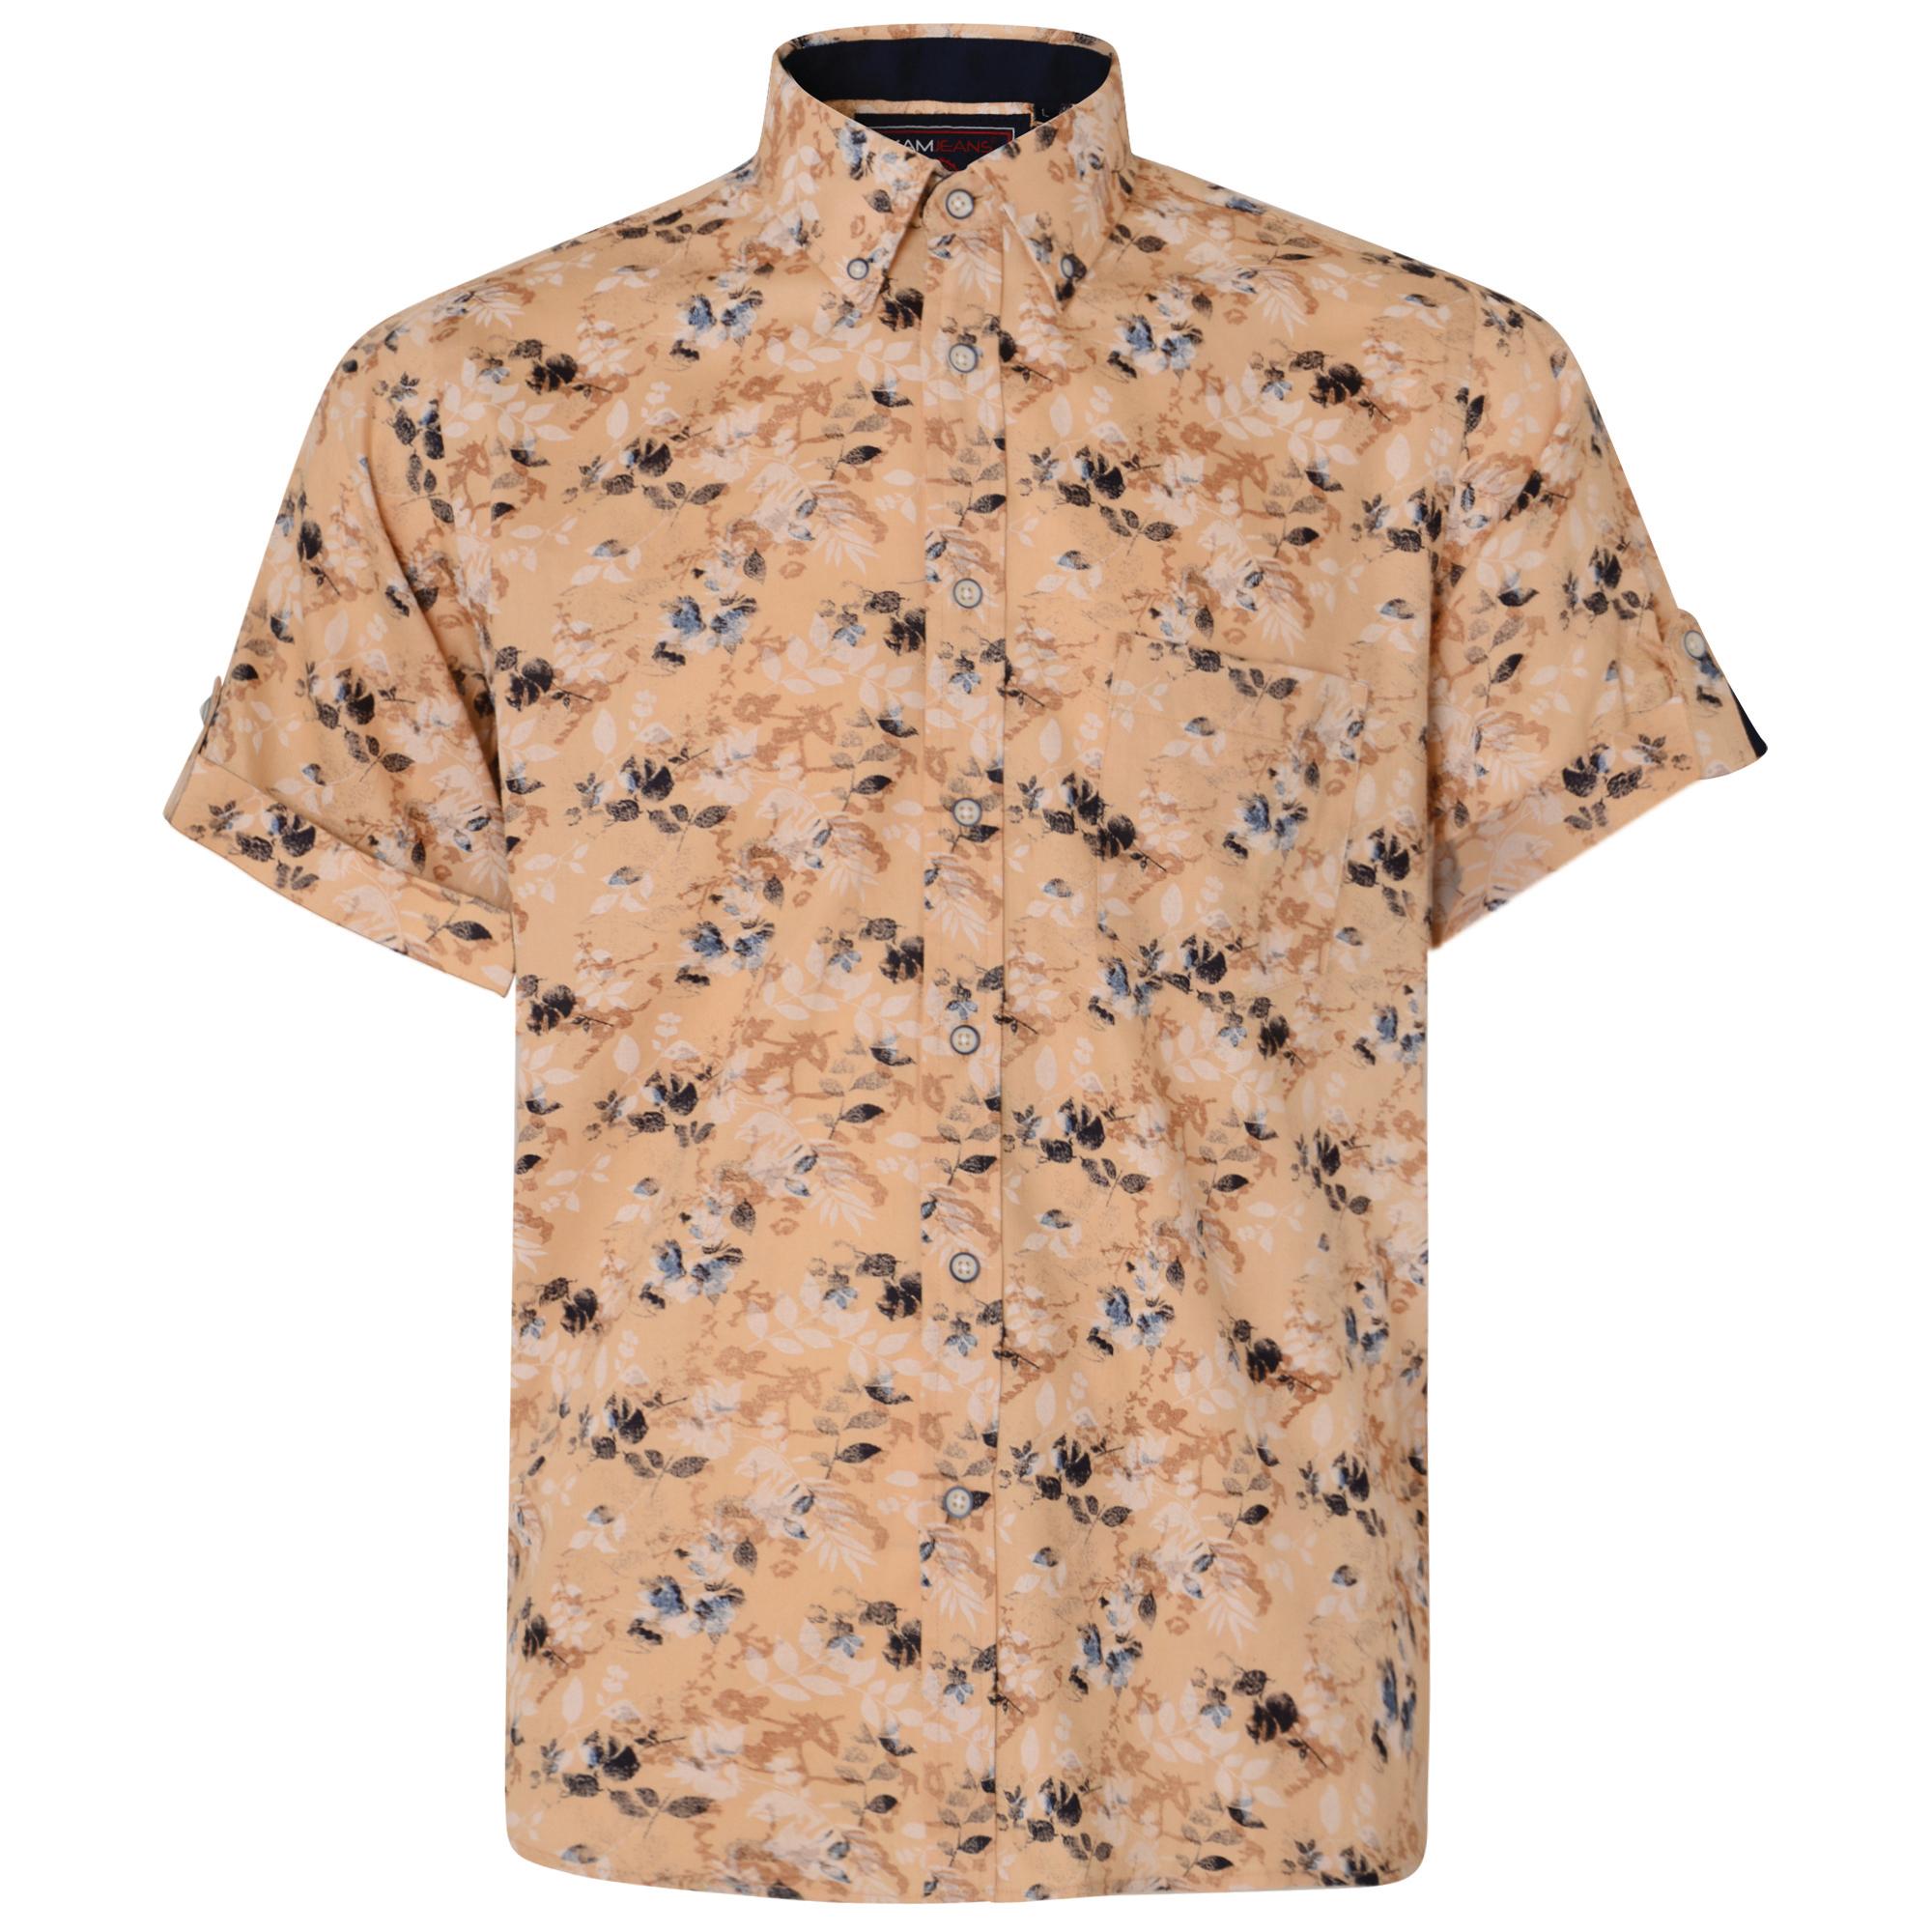 Overhemd Floral Print van merk KAM Jeanswear, zandkleur, gemaakt van 100% katoen.